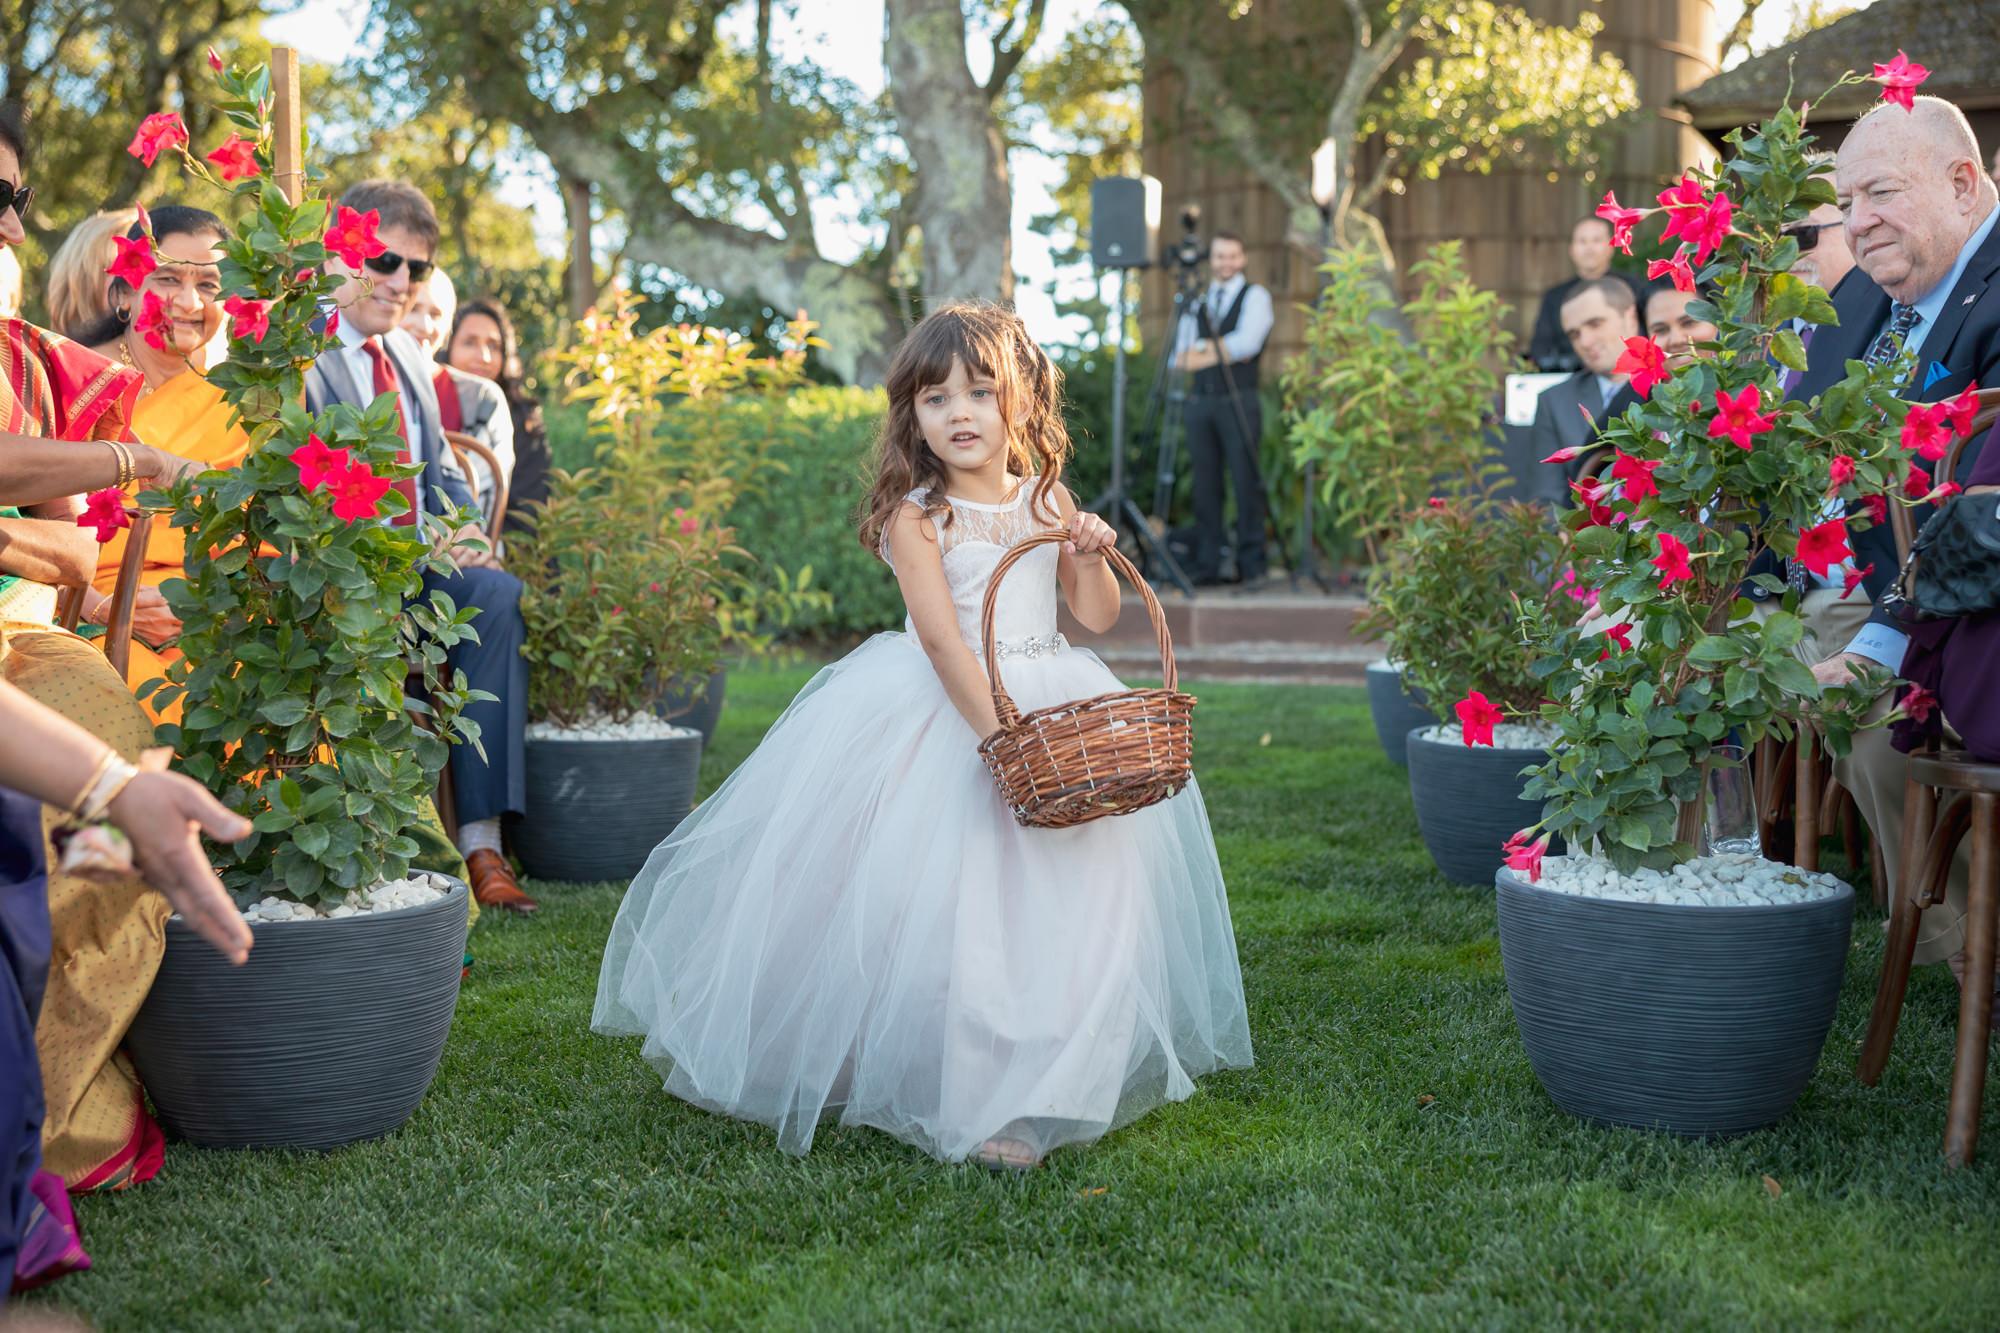 Darling flower girl goes down the aisle  - Roberto Valenzuela Weddings